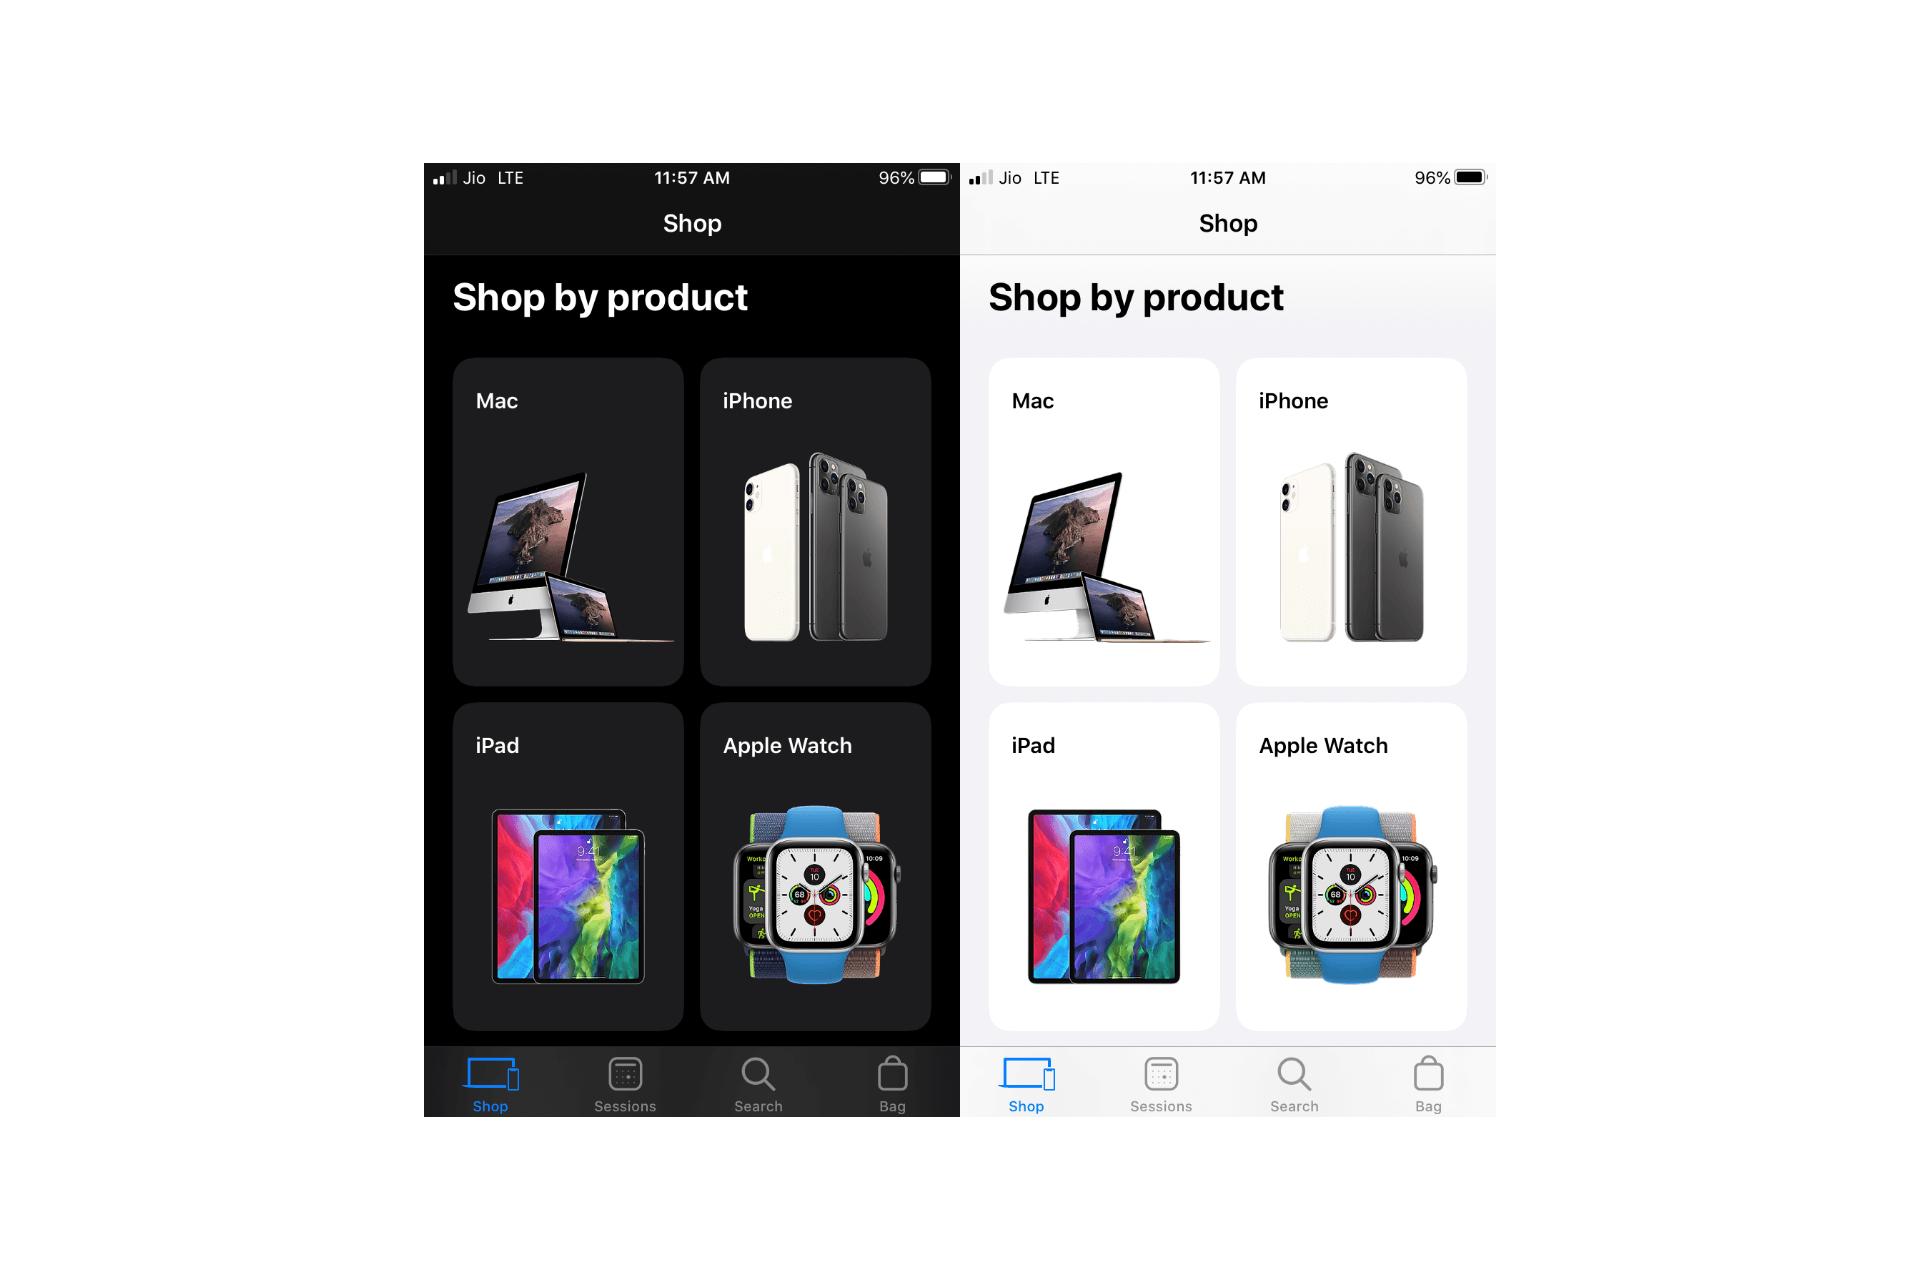 Apple Store App Now Support Dark Mode